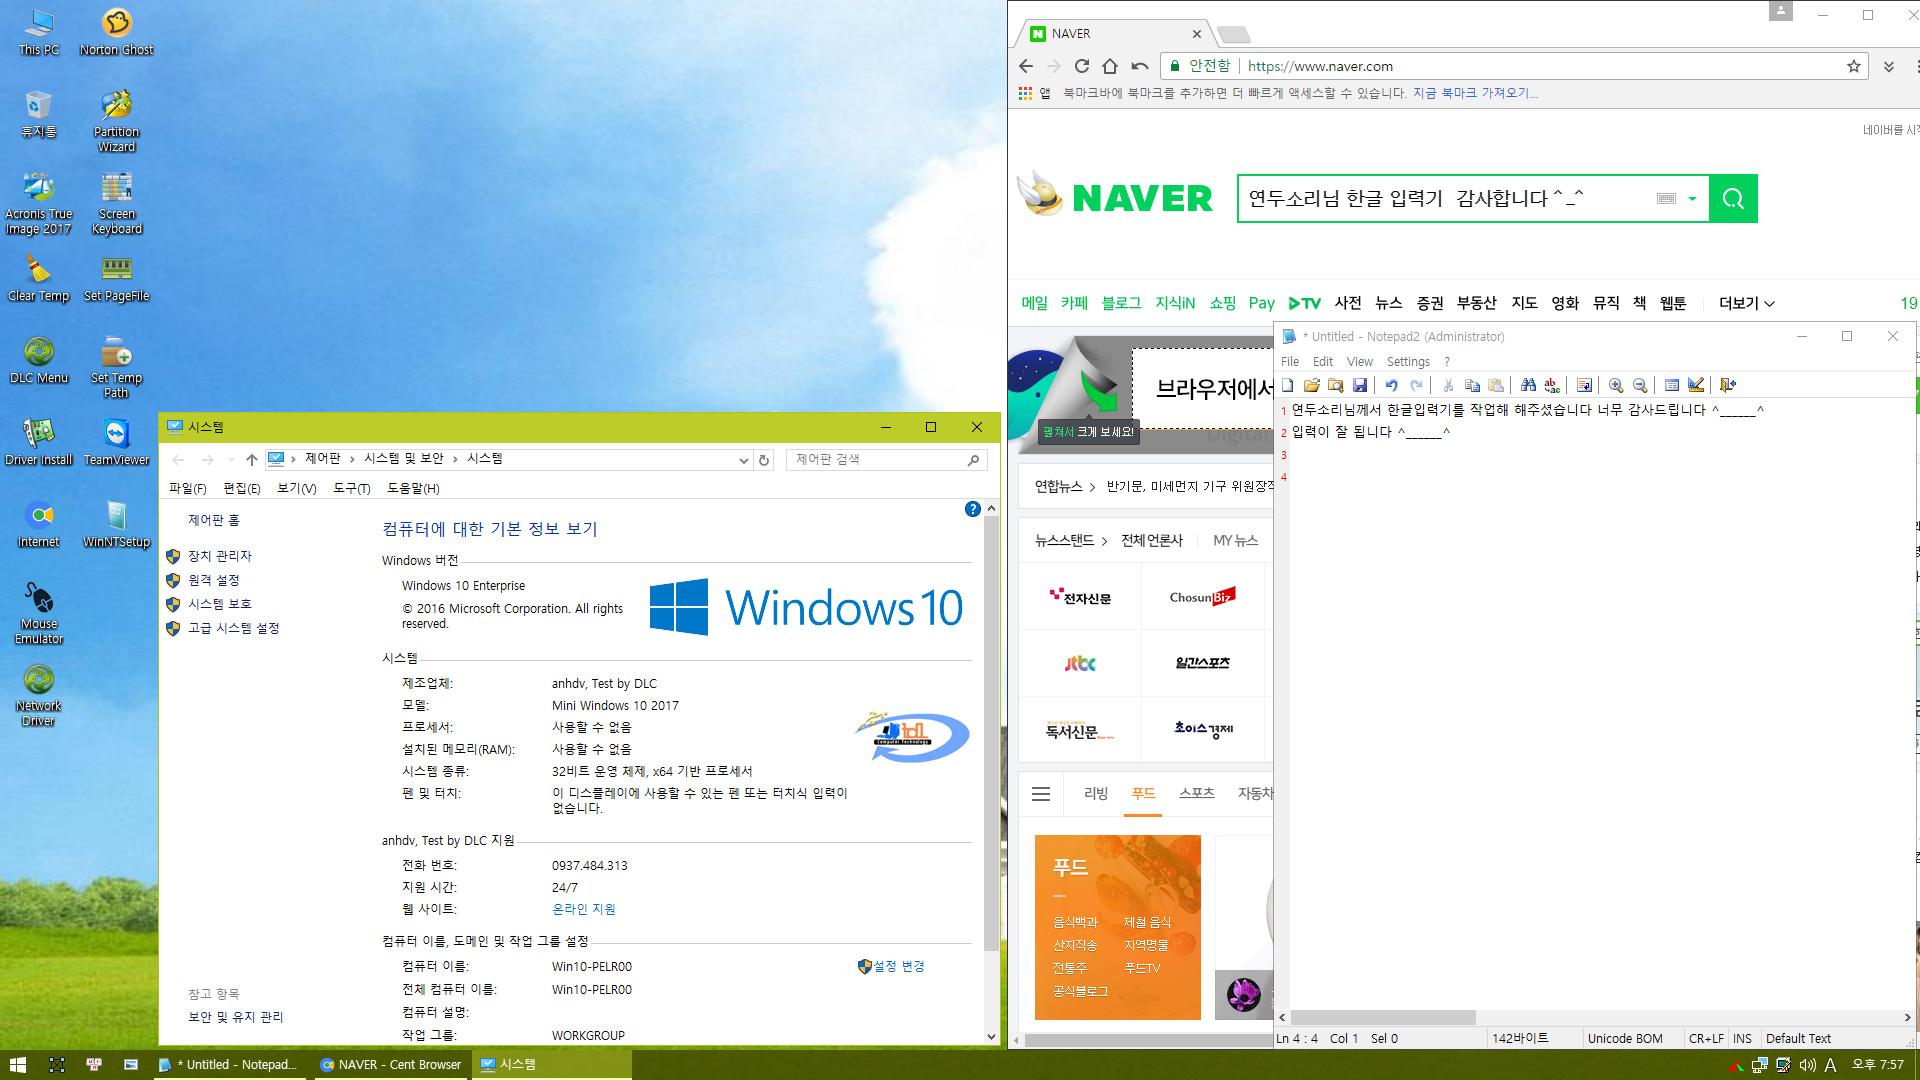 Win10 x86 한글입력기 연두소리님께 감사드립니다 ^^.jpg